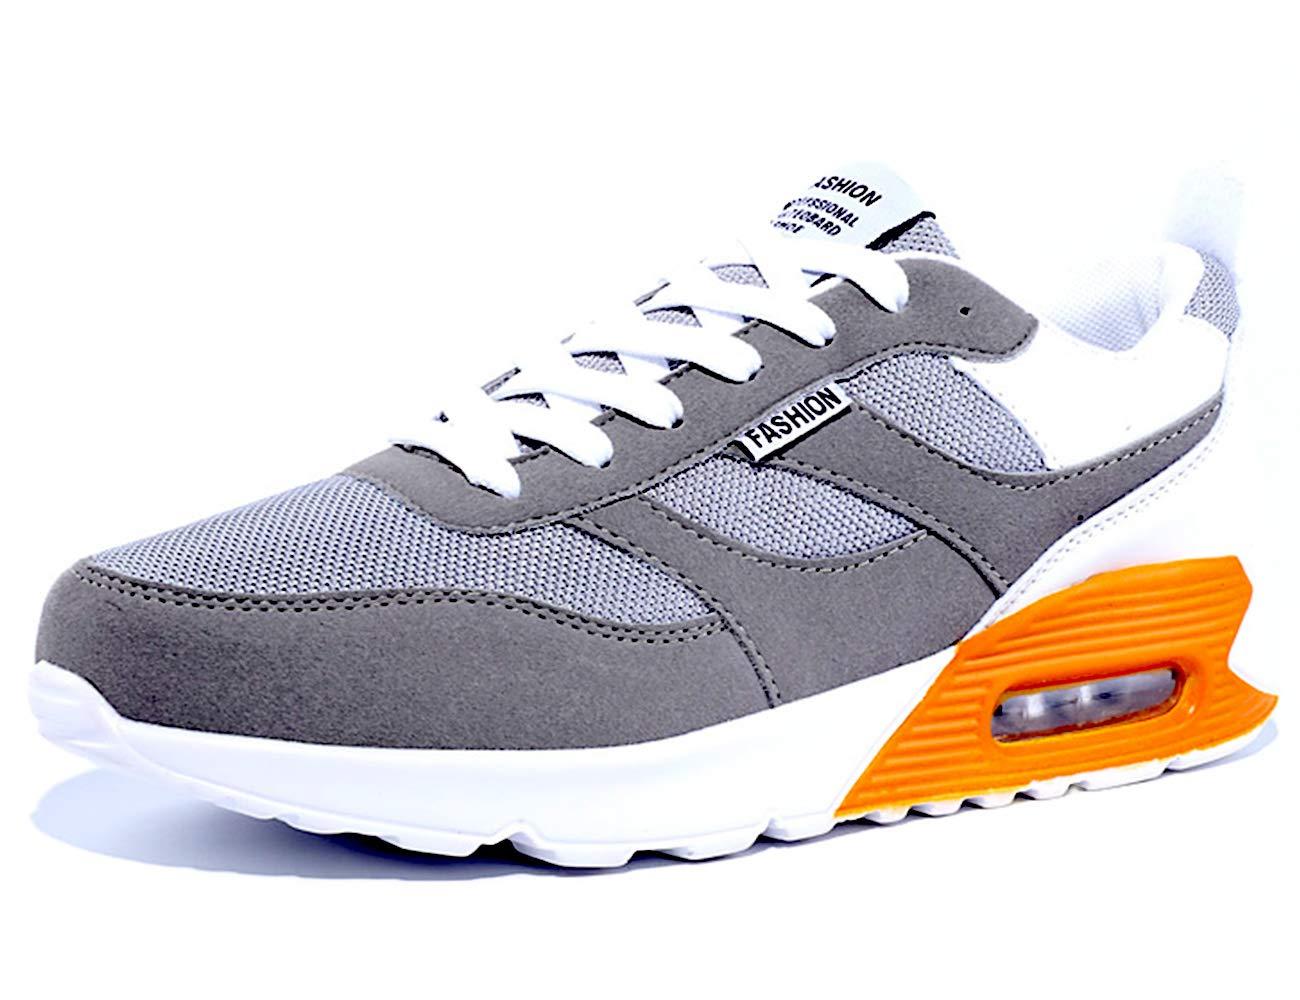 GJRRX Zapatillas Deporte Hombre Zapatos para Correr Athletic Cordones Air Cushion Running Sports Sneakers Zapatos Antideslizantes Ligeros 2211